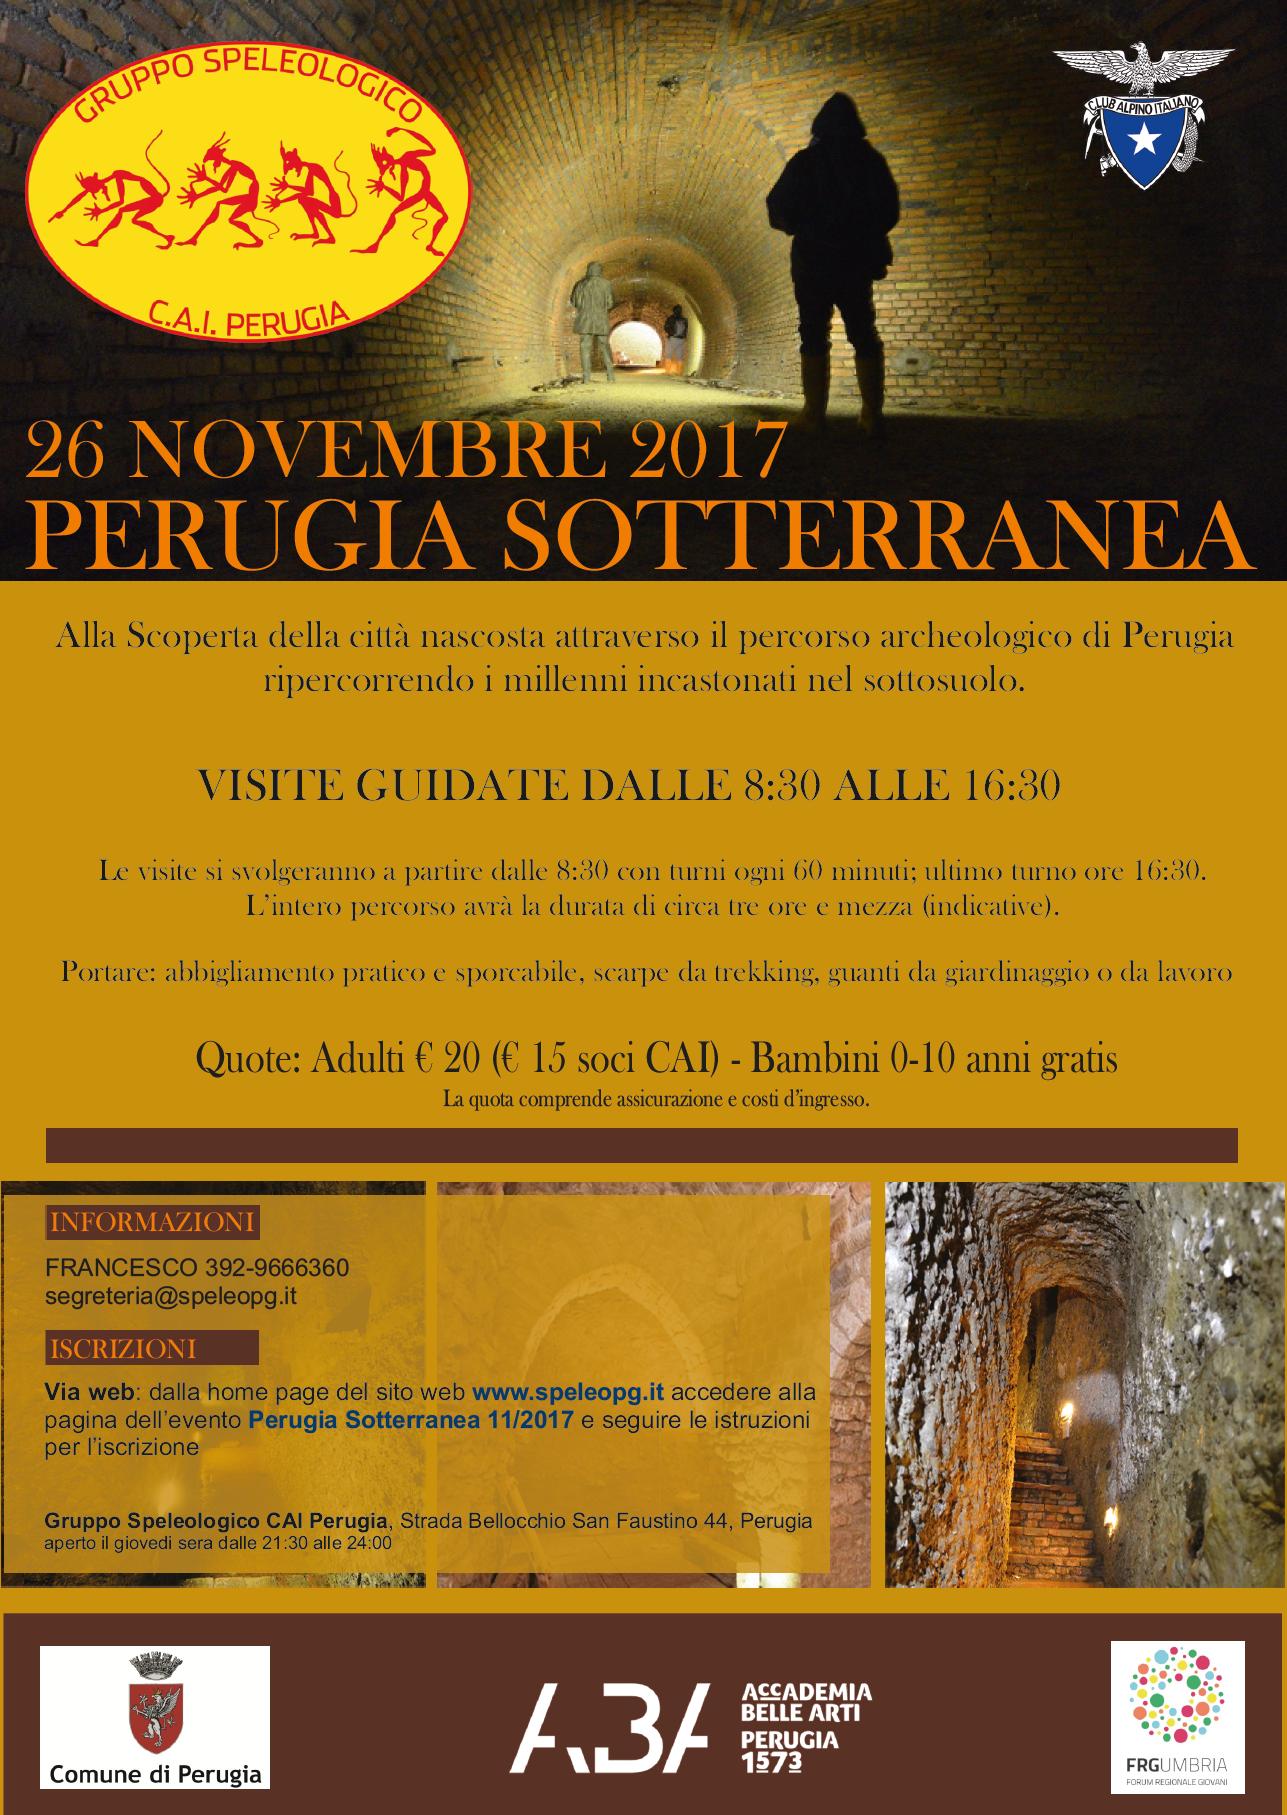 Perugia Sotterranea 11/2017